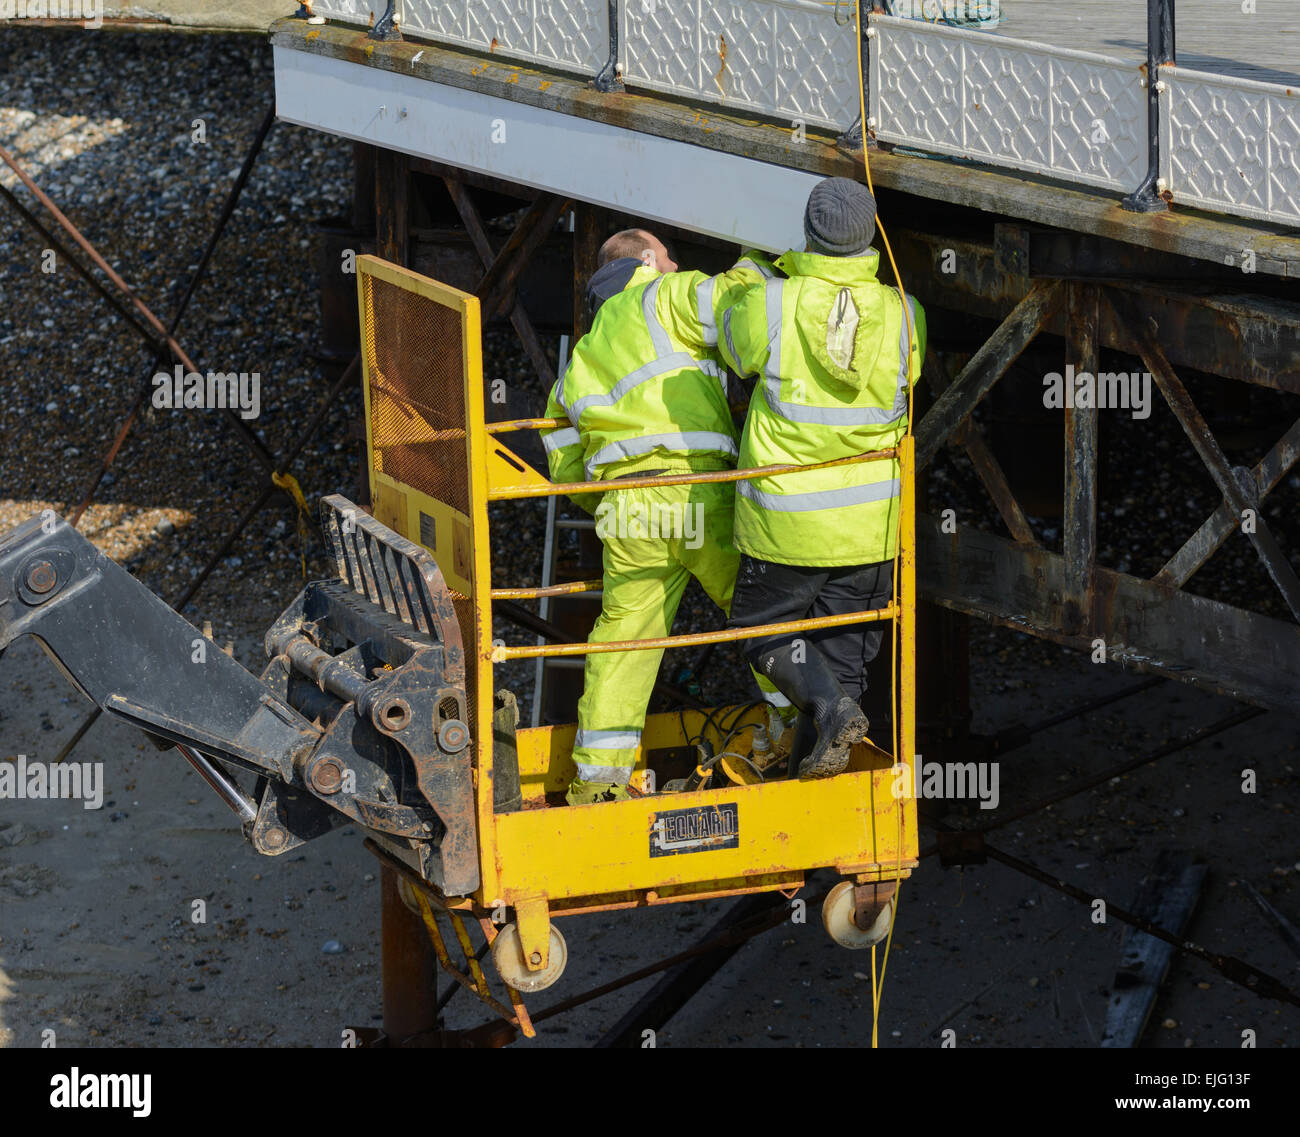 2 workmen in a cherry picker. - Stock Image